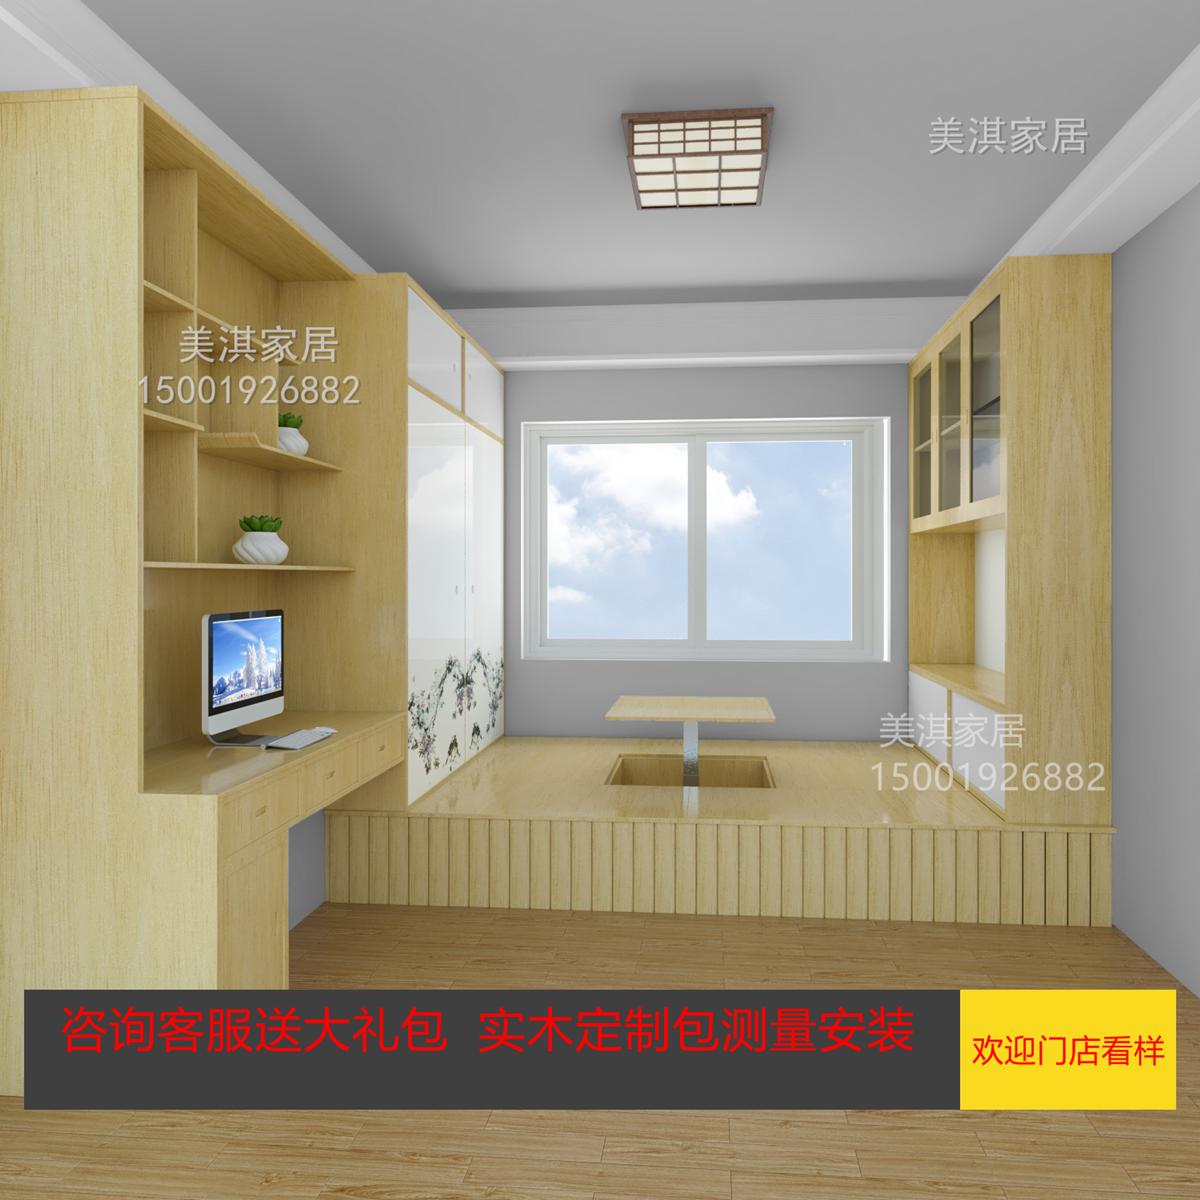 Hangzhou custom integral wood bed storage platform and customized Japanese tatami whole house furniture